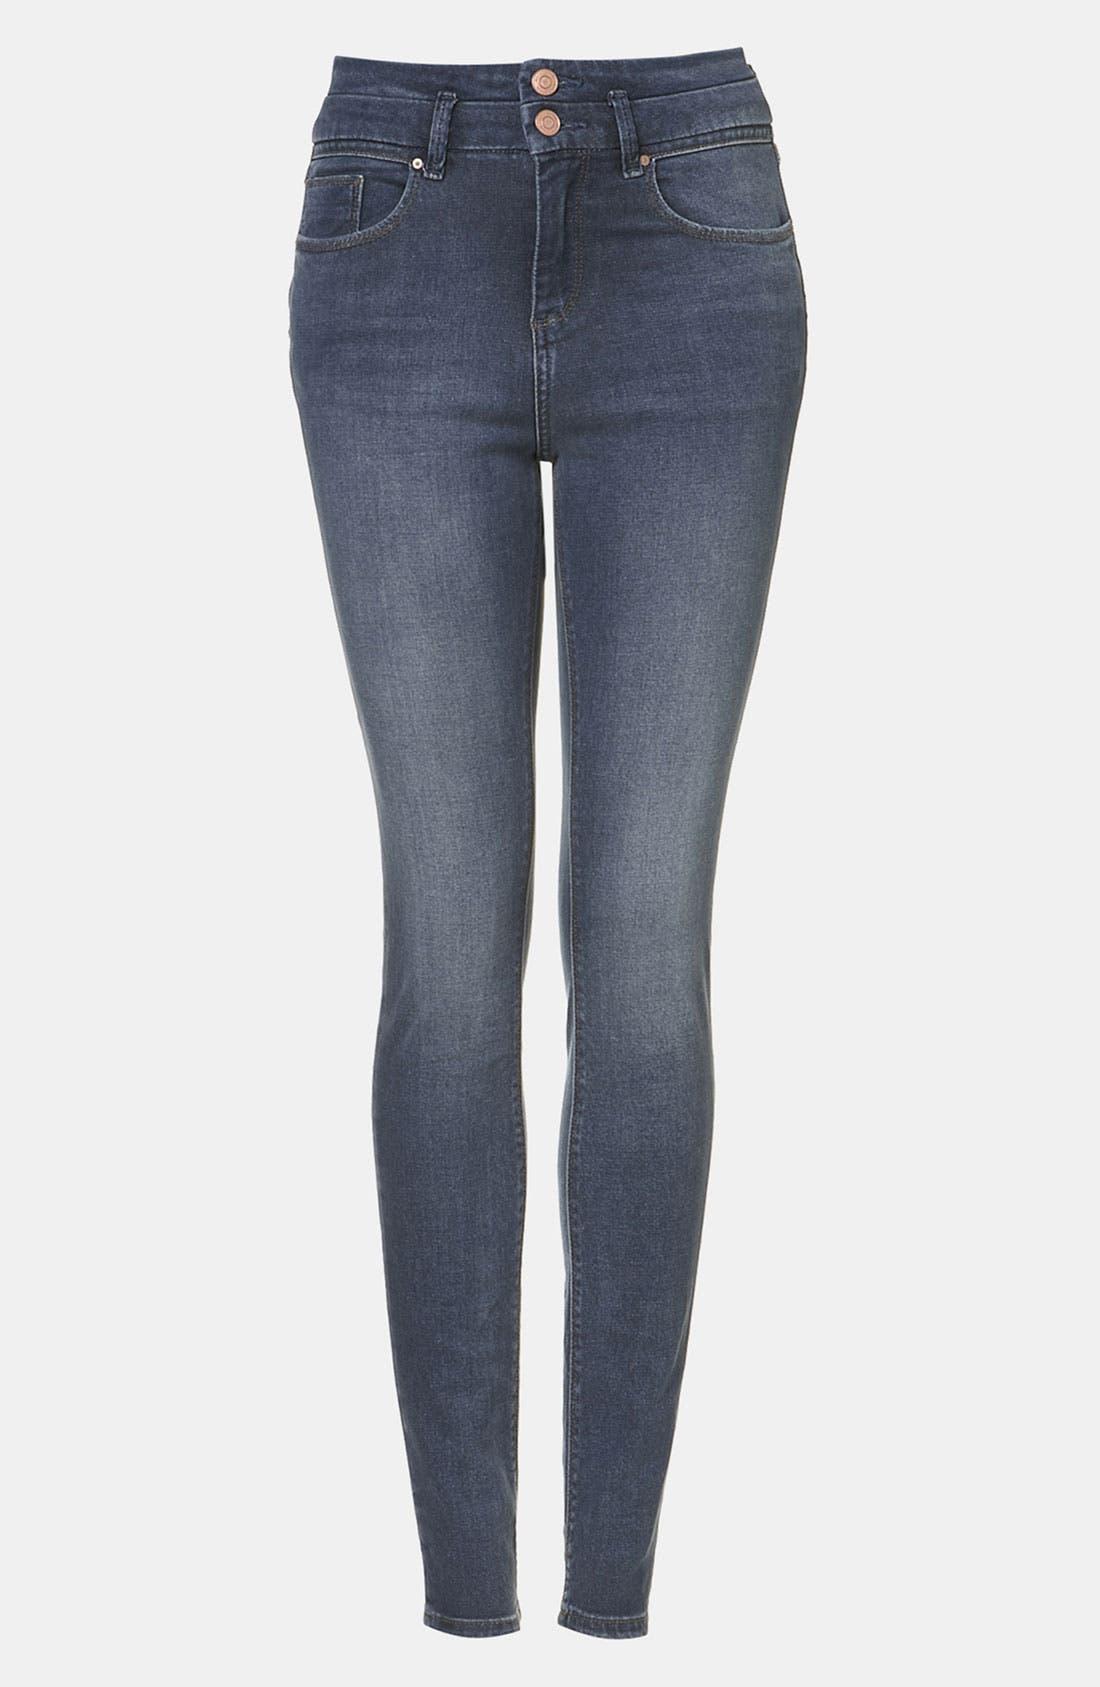 Main Image - Topshop Moto 'Kristen' High Waist Skinny Jeans (Midstone)